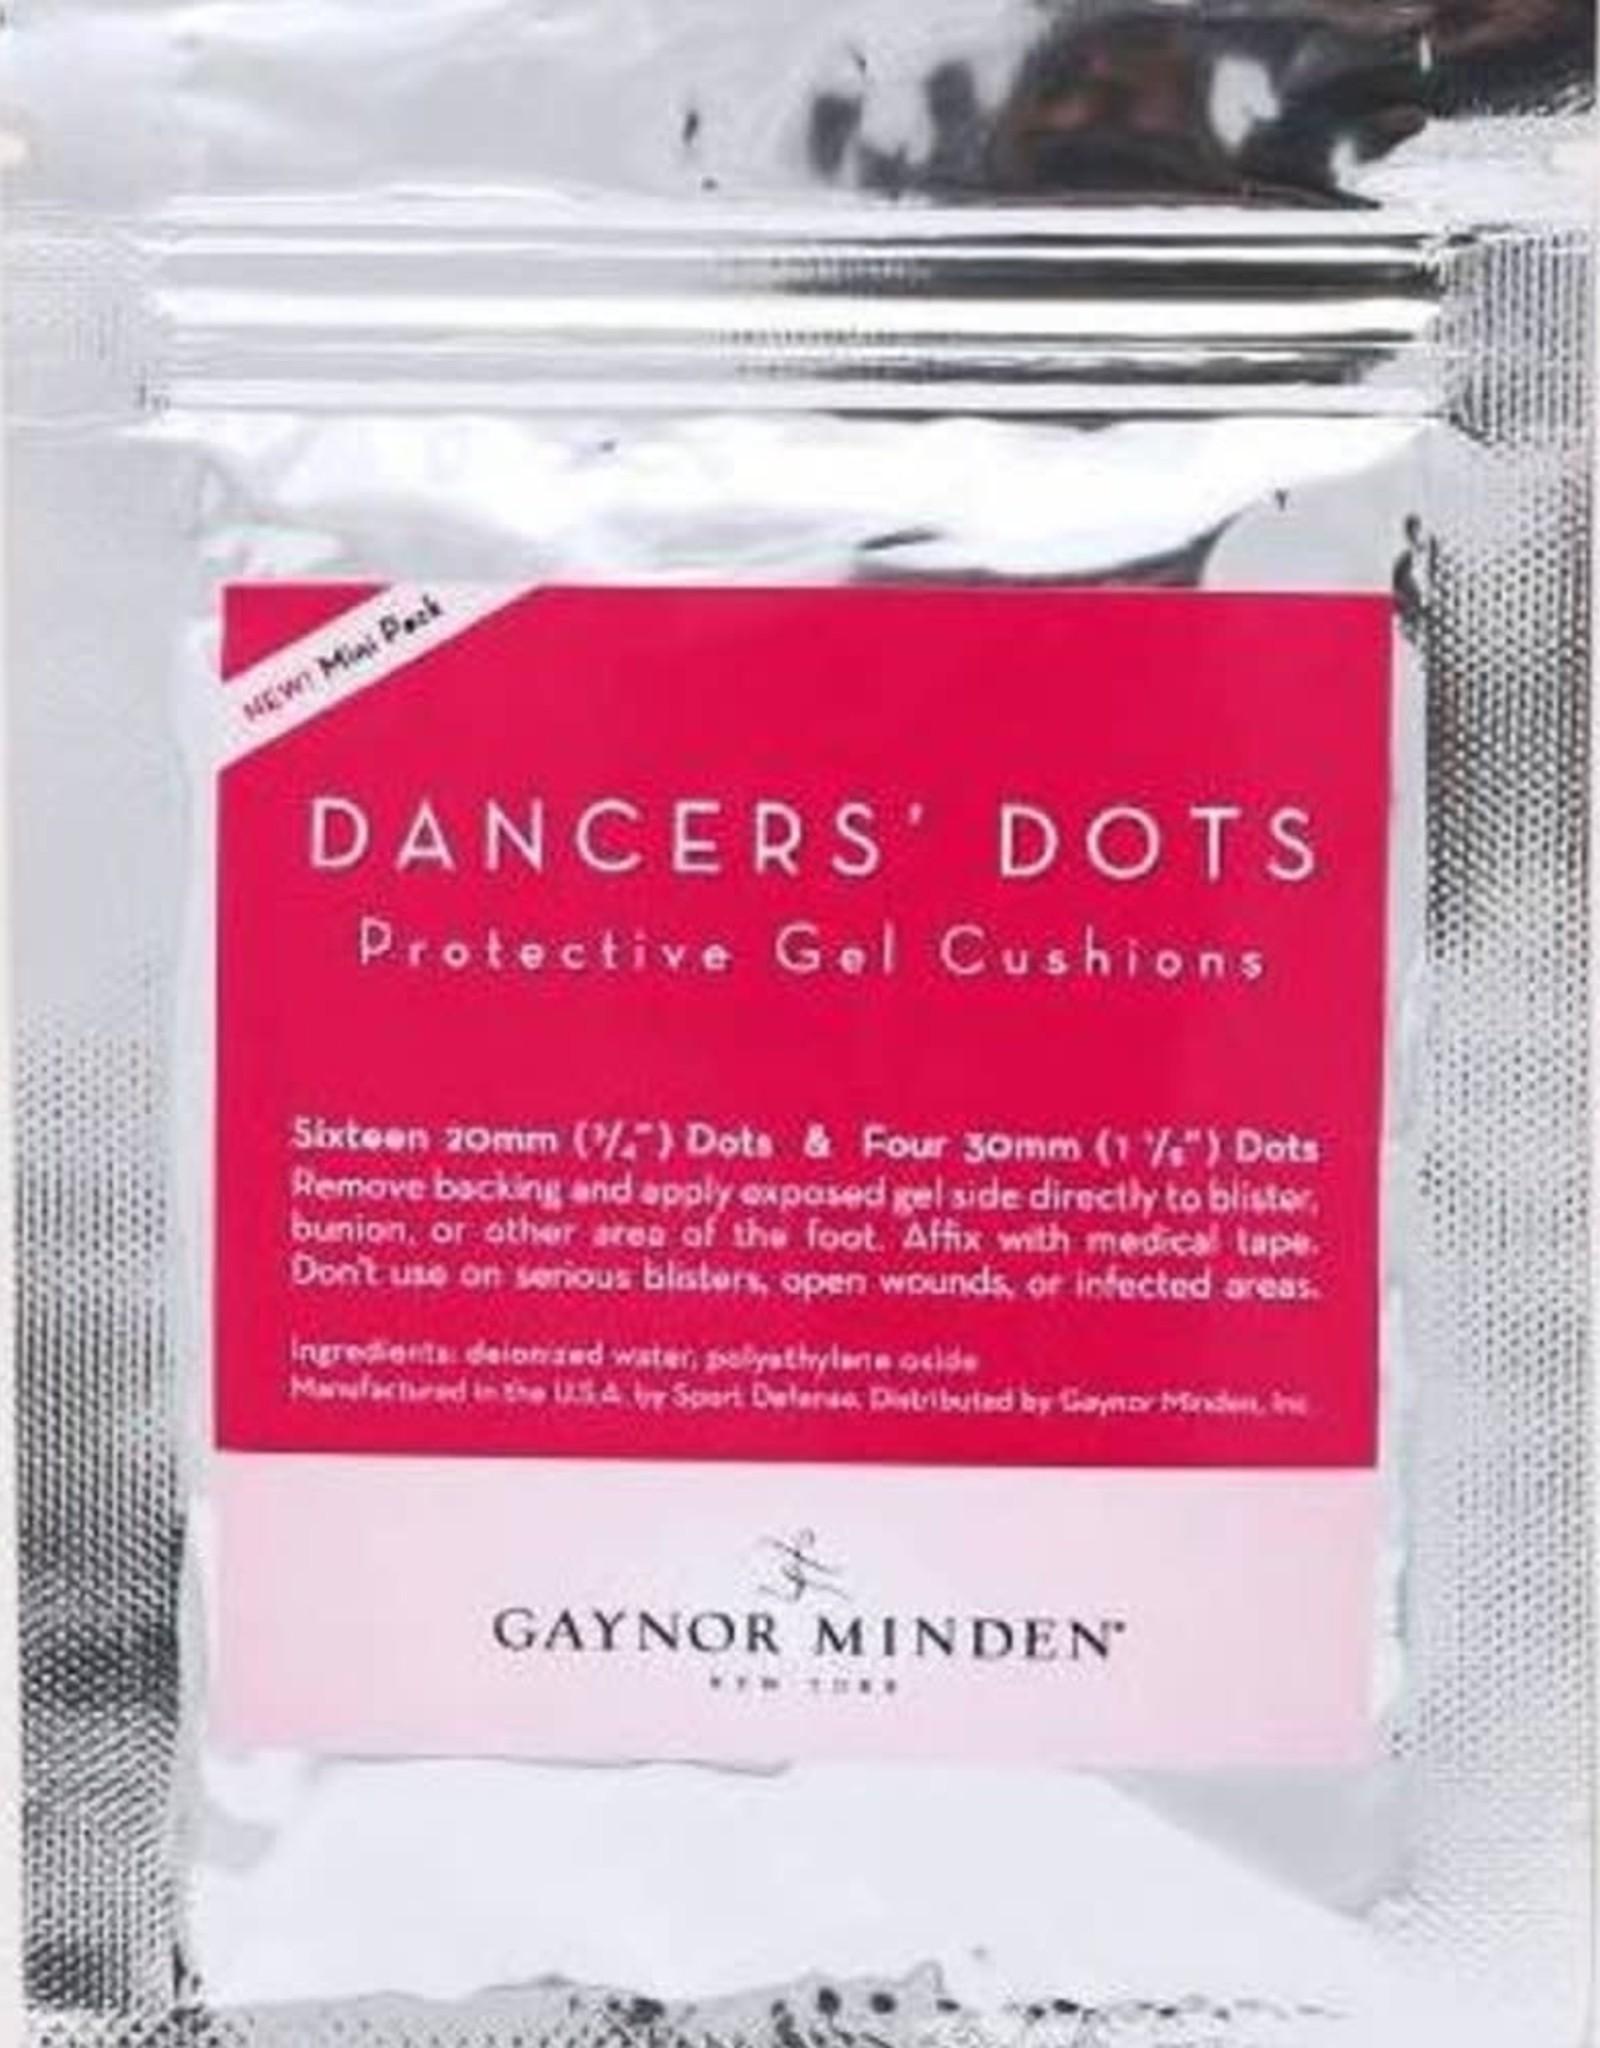 Gaynor Minden Gaynor Minden Dancer Dot Mini Packets